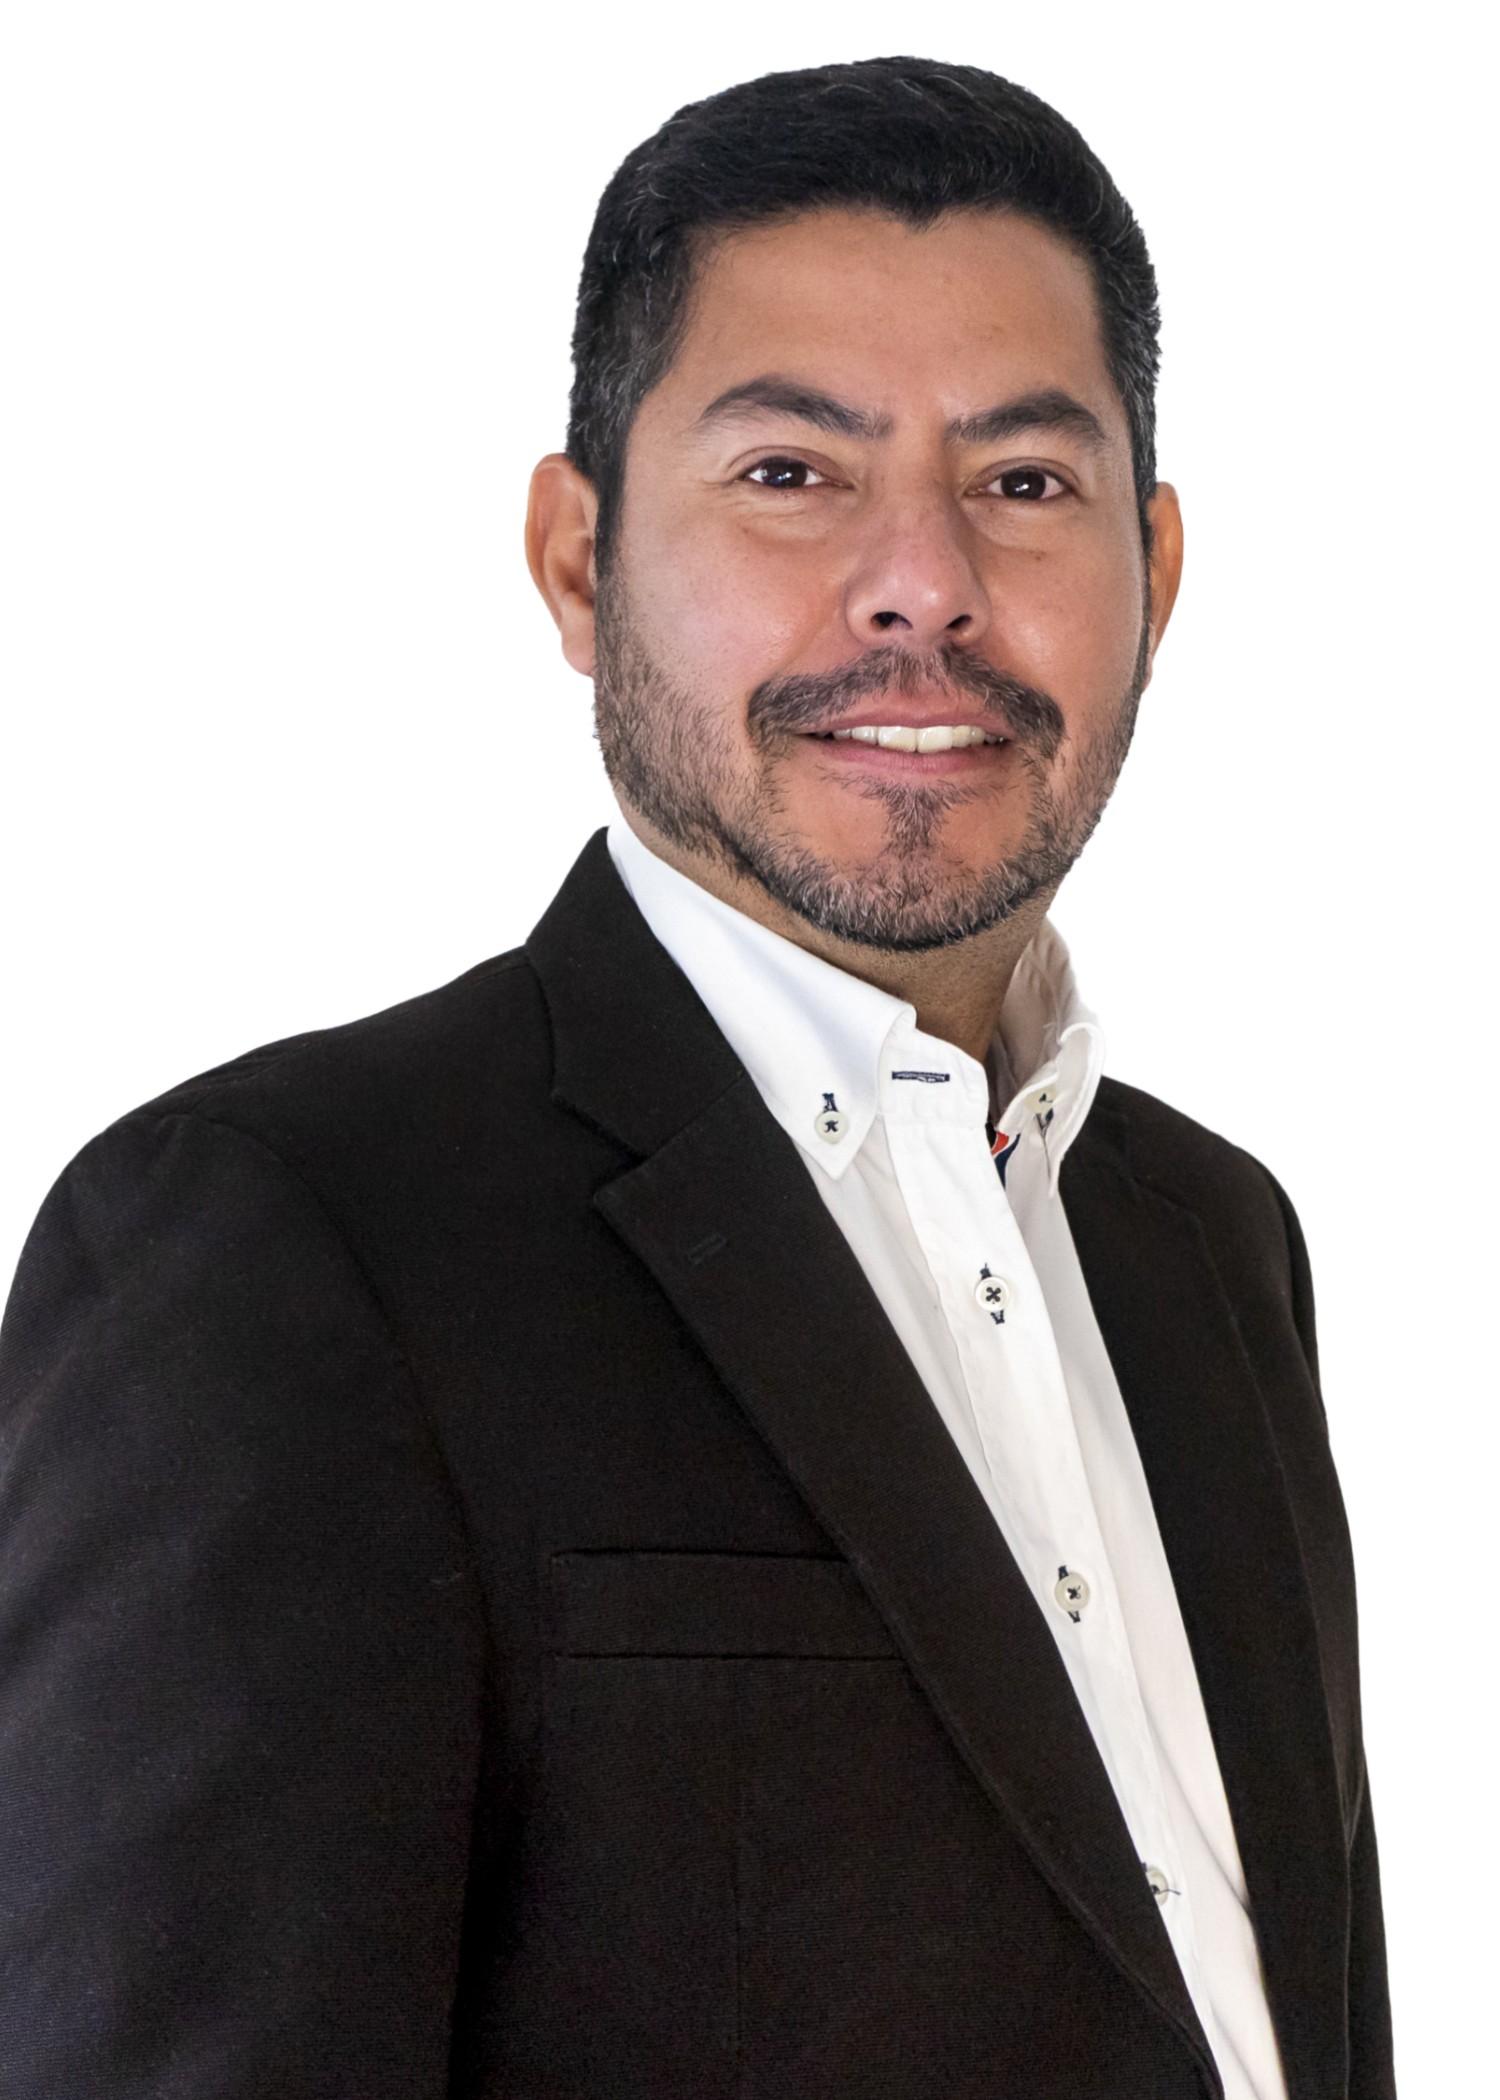 Fernando Avendano Marcano